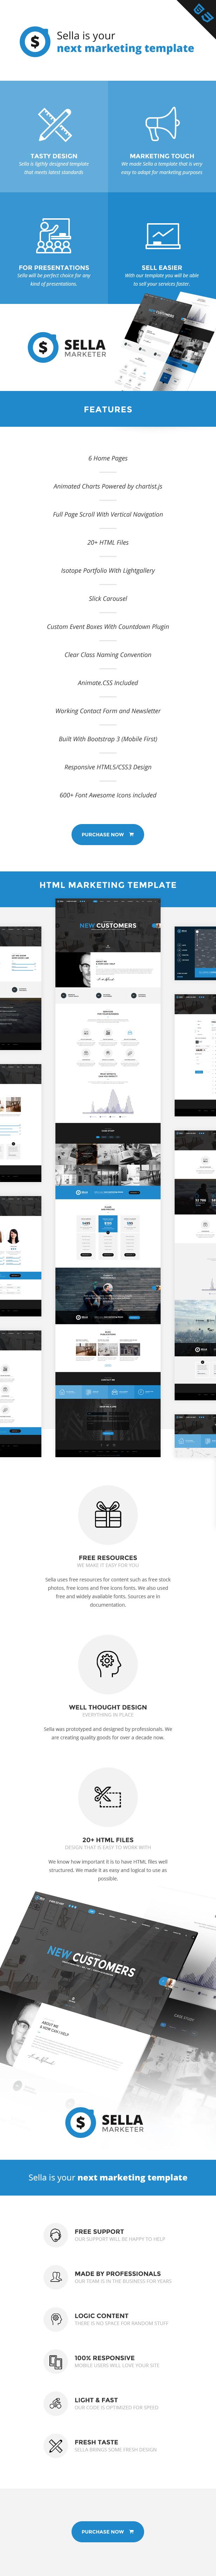 Sella - Marketing HTML Template by ThemesOverflow   ThemeForest